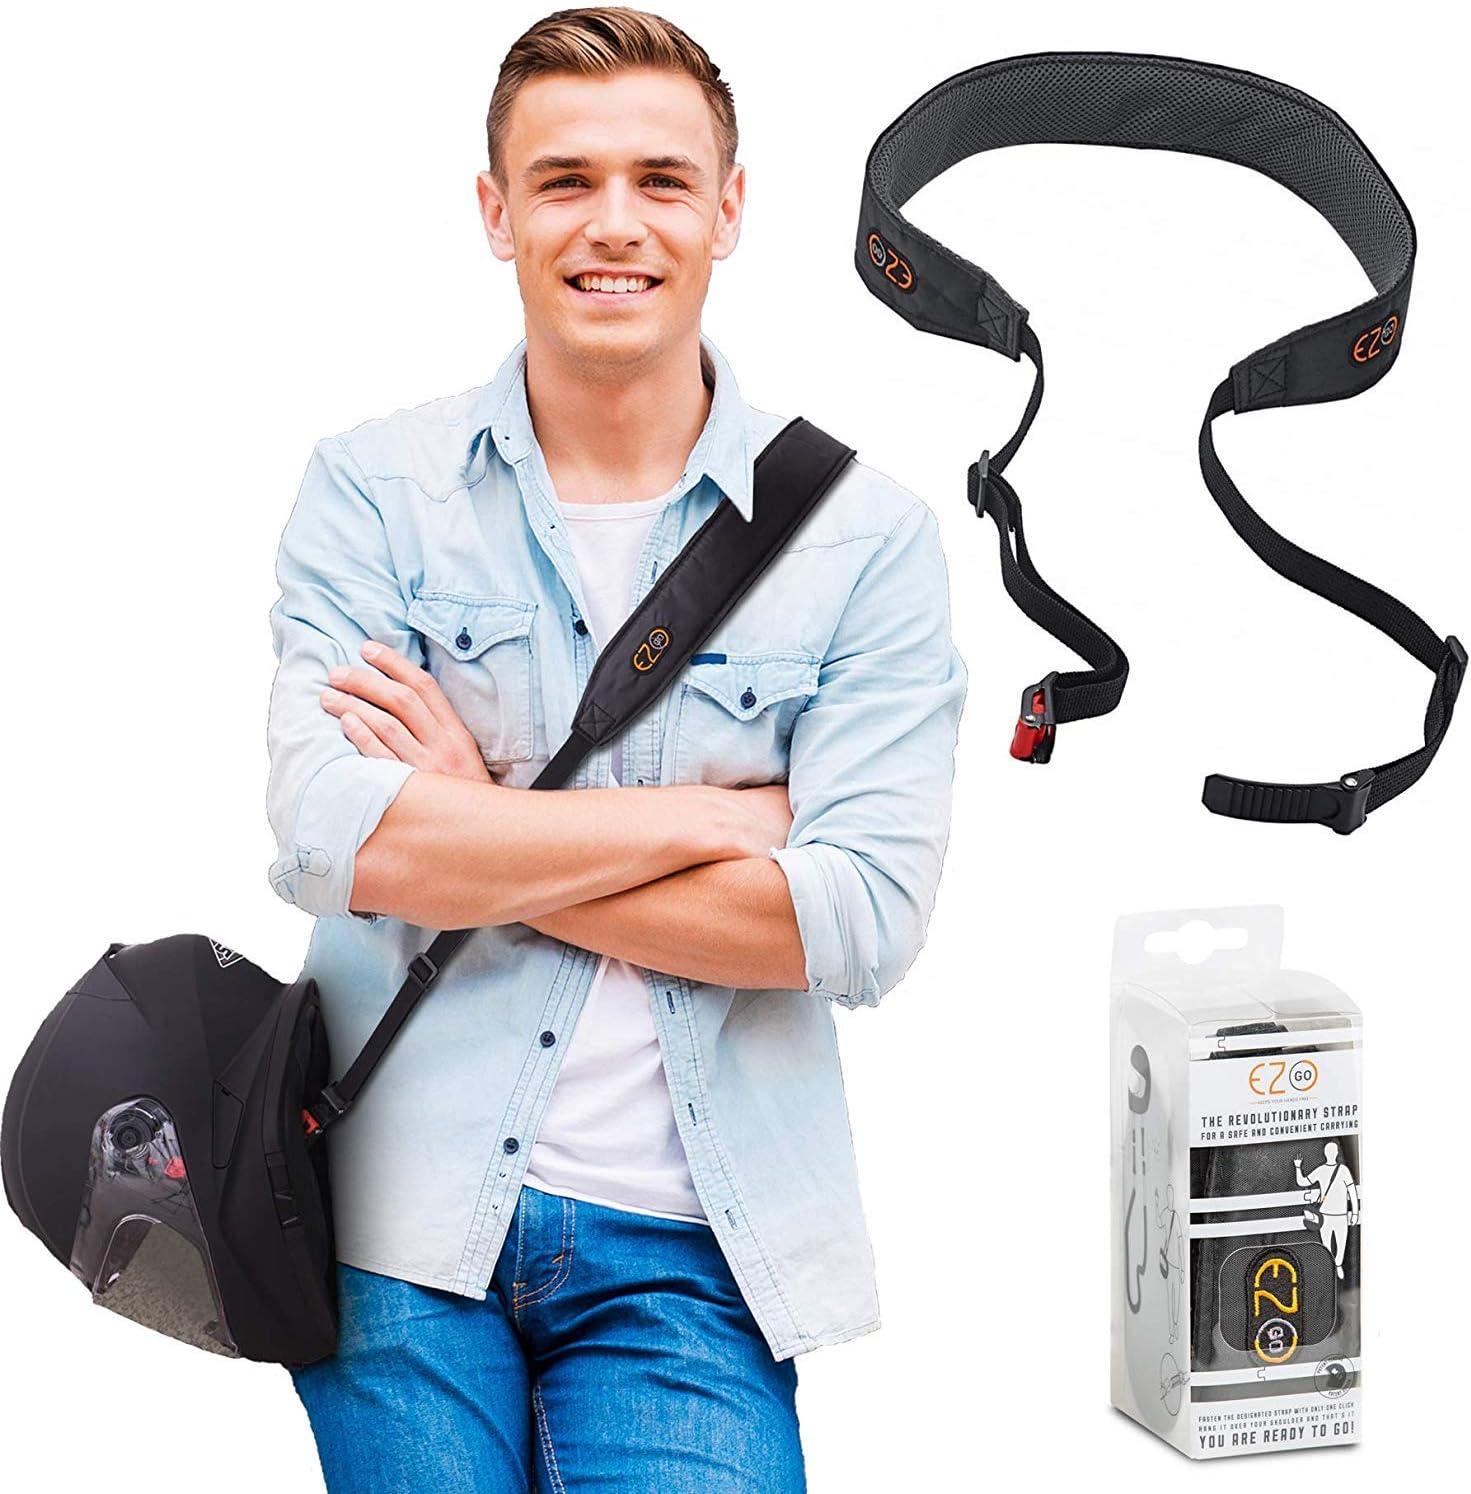 EZ GO Porta Cascos para Moto - Correa de Transporte Ajustable Manos Libres para Casco - Alternativa Ligera y Cómoda a la Bolsa para Casco - Accesorio de Moto Ideal como Regalo para Hombre o Mujer